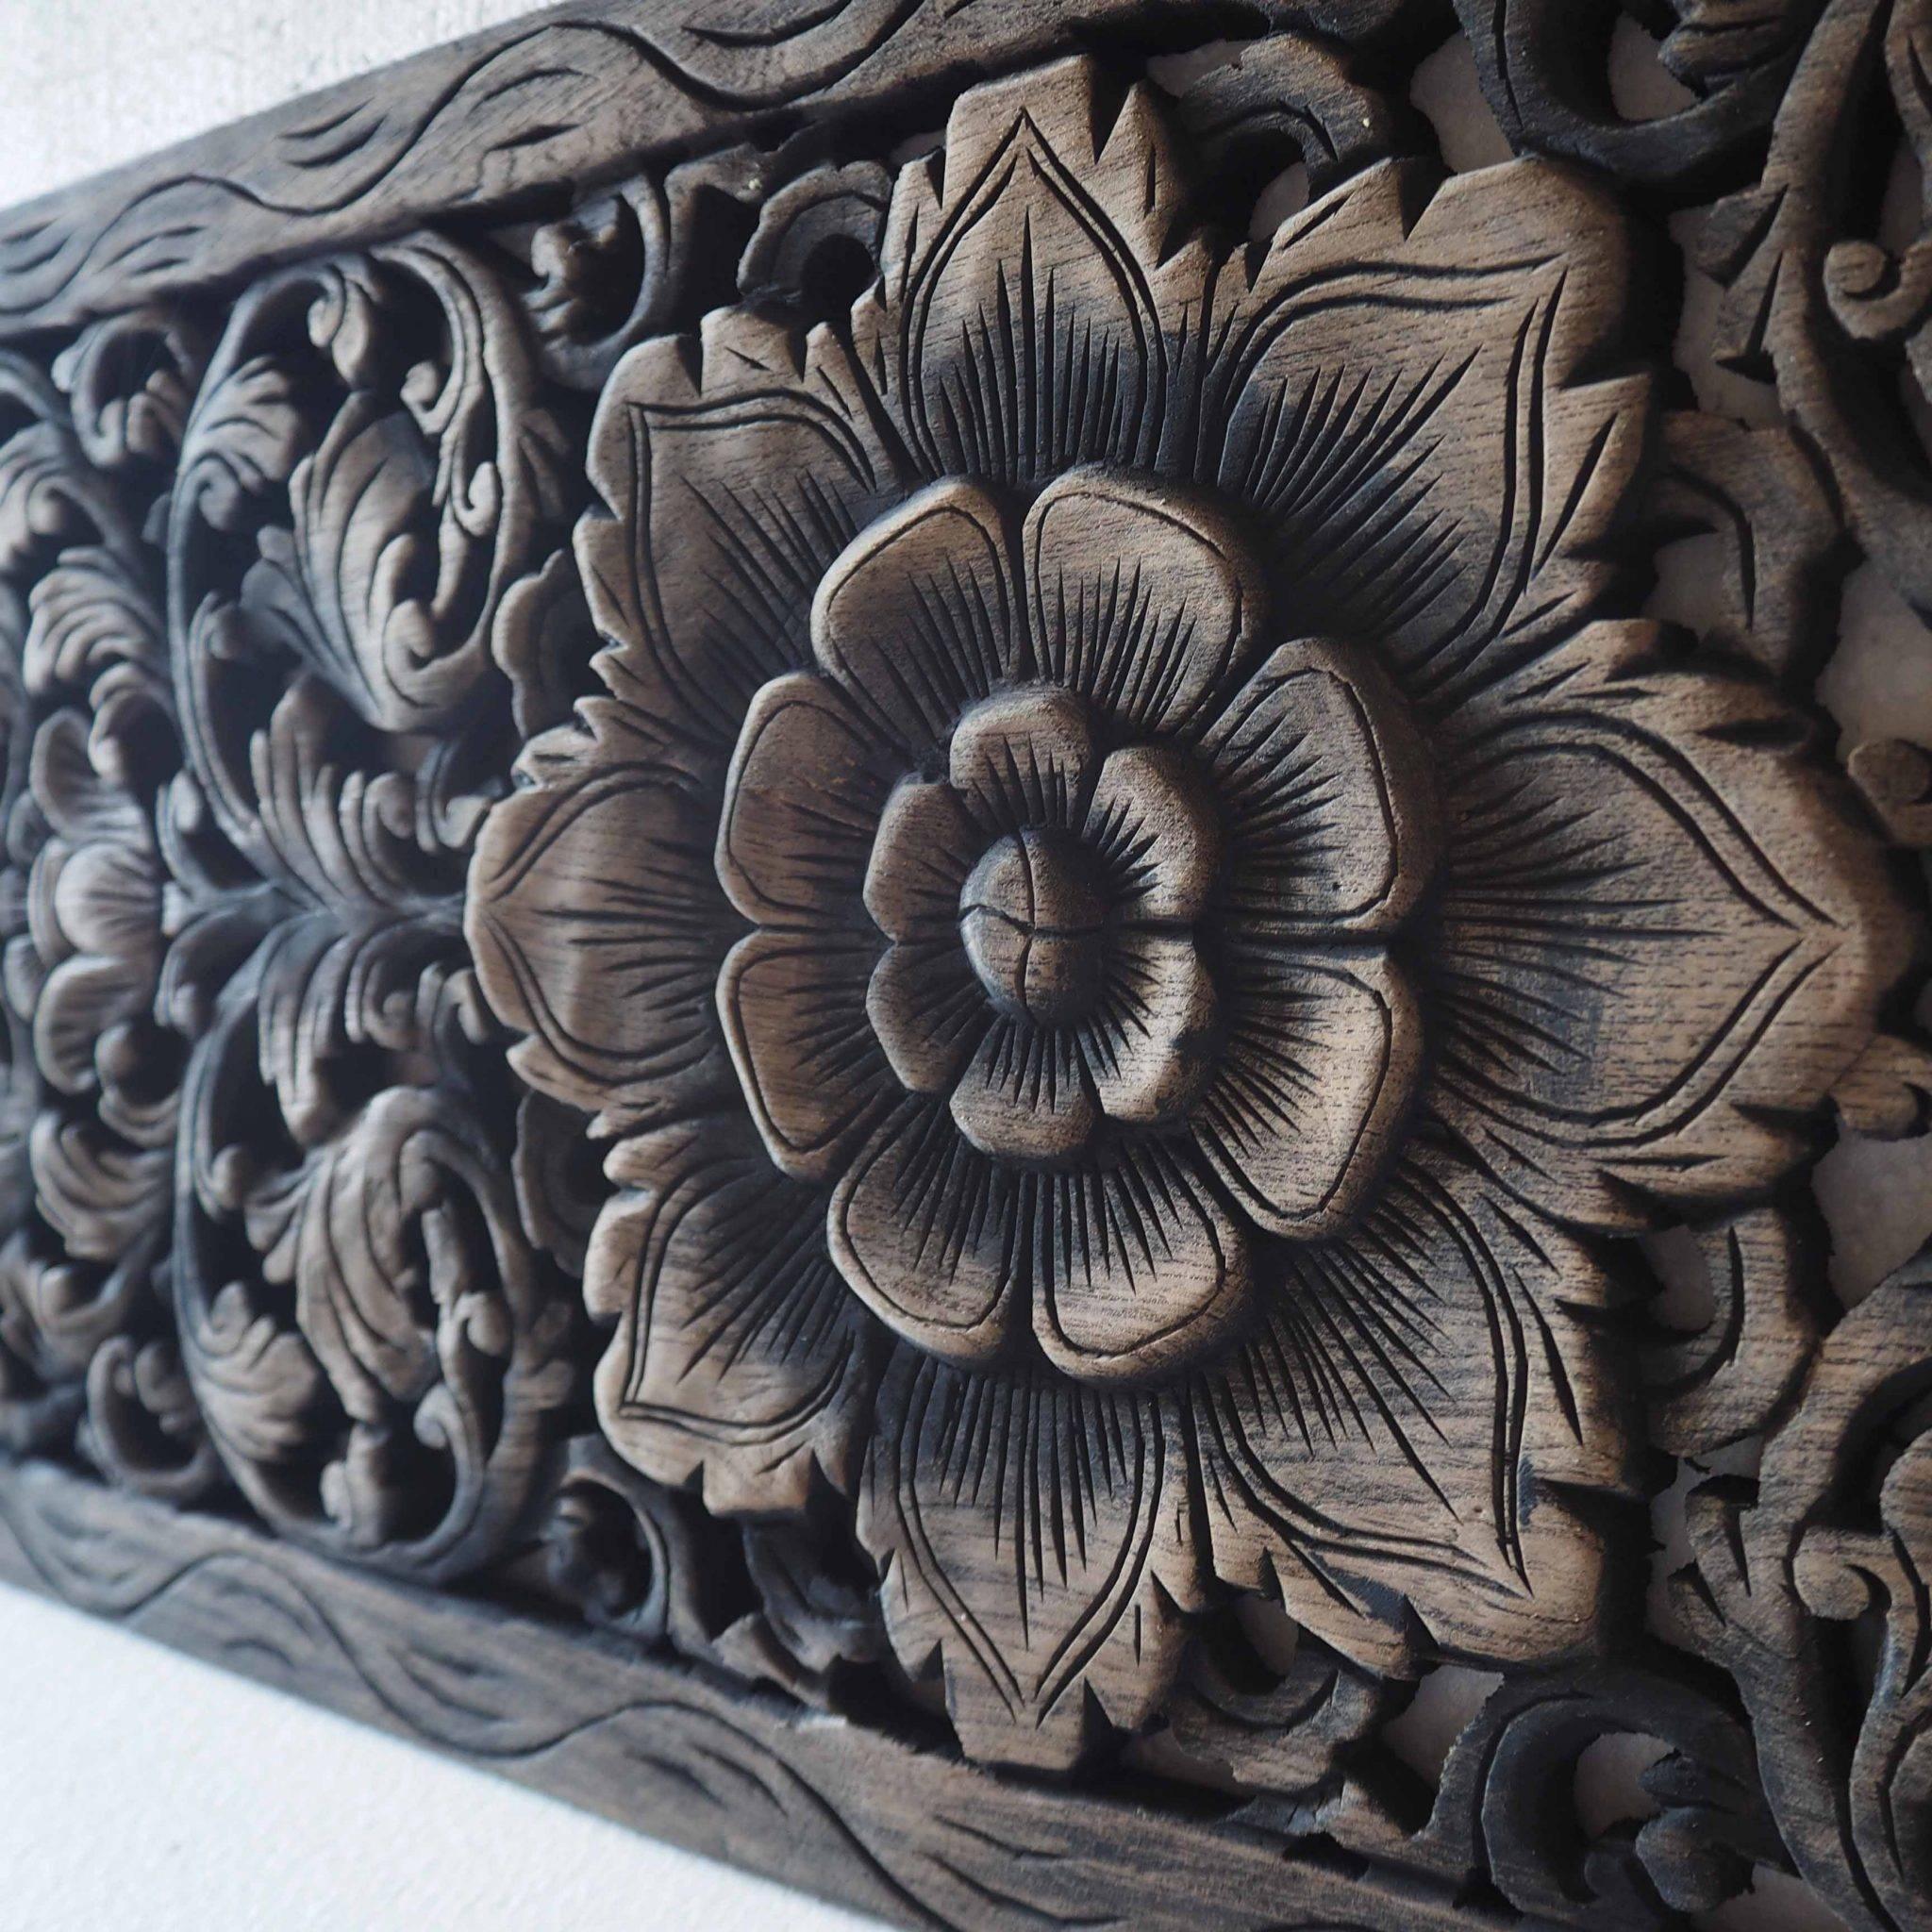 Thai Lotus Wood Carving Wall Art Panel – Siam Sawadee Within Newest Wood Carved Wall Art Panels (View 20 of 25)